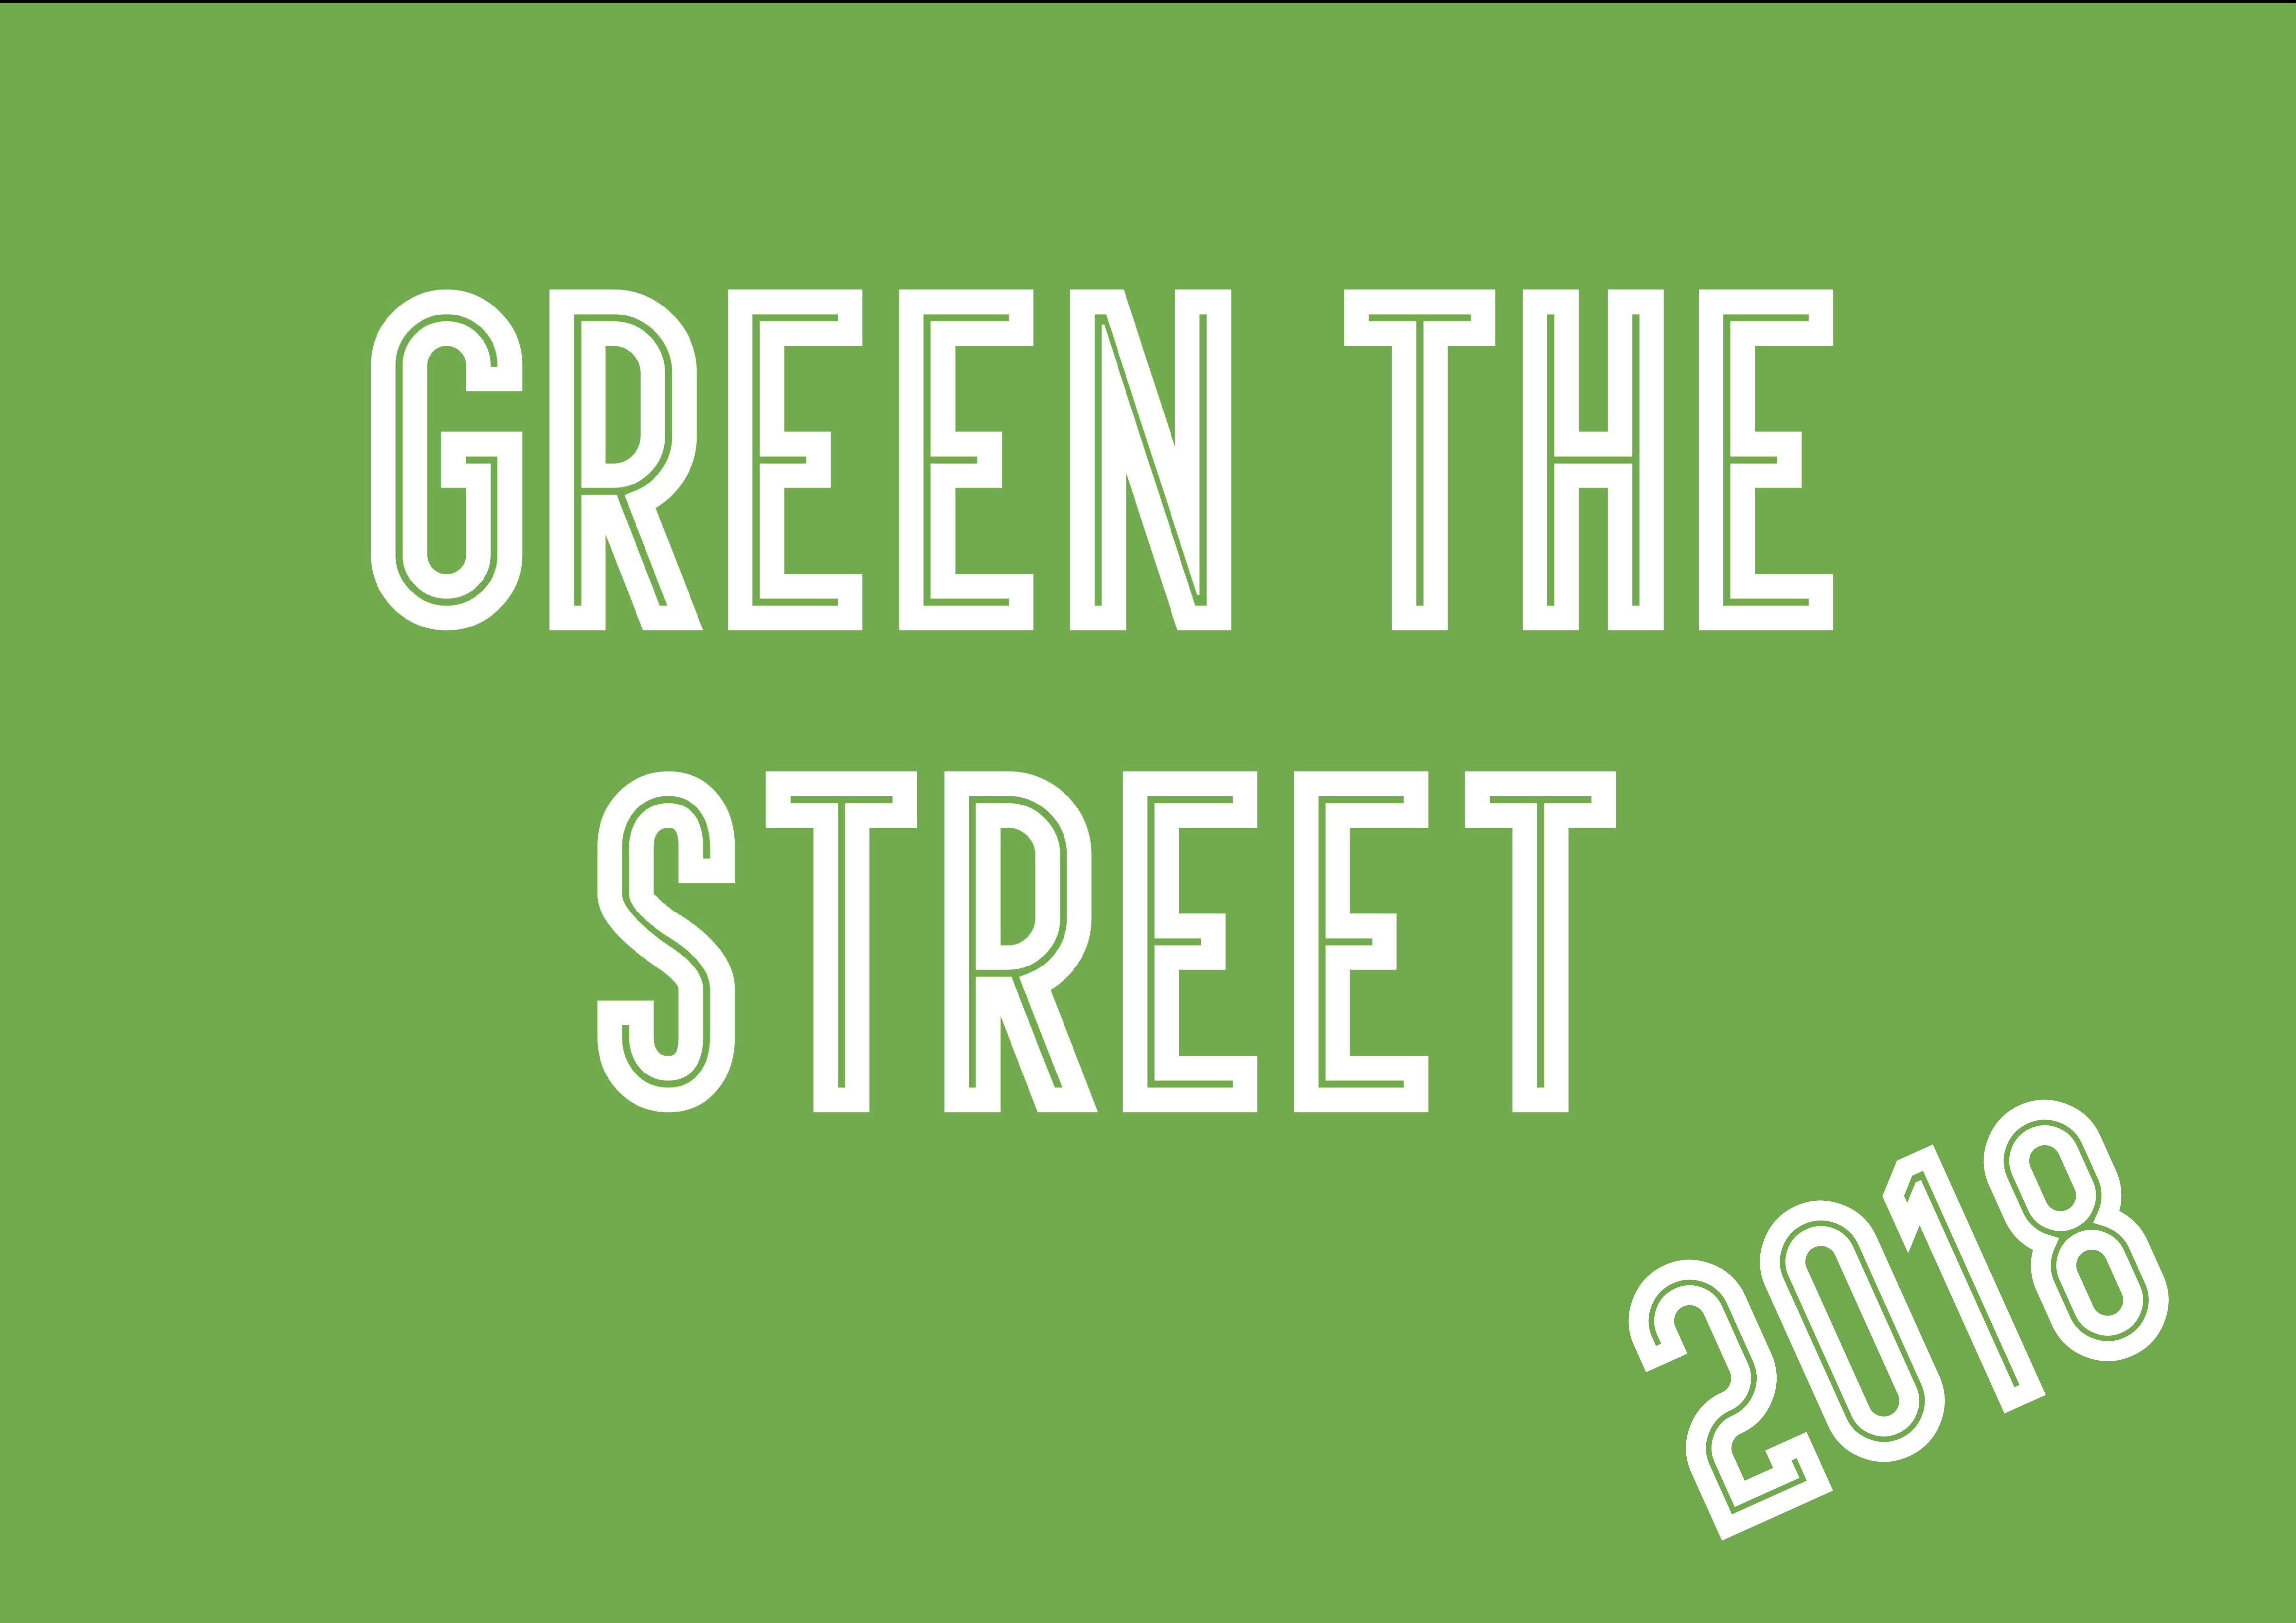 GREEN THE STREET 2018.jpg